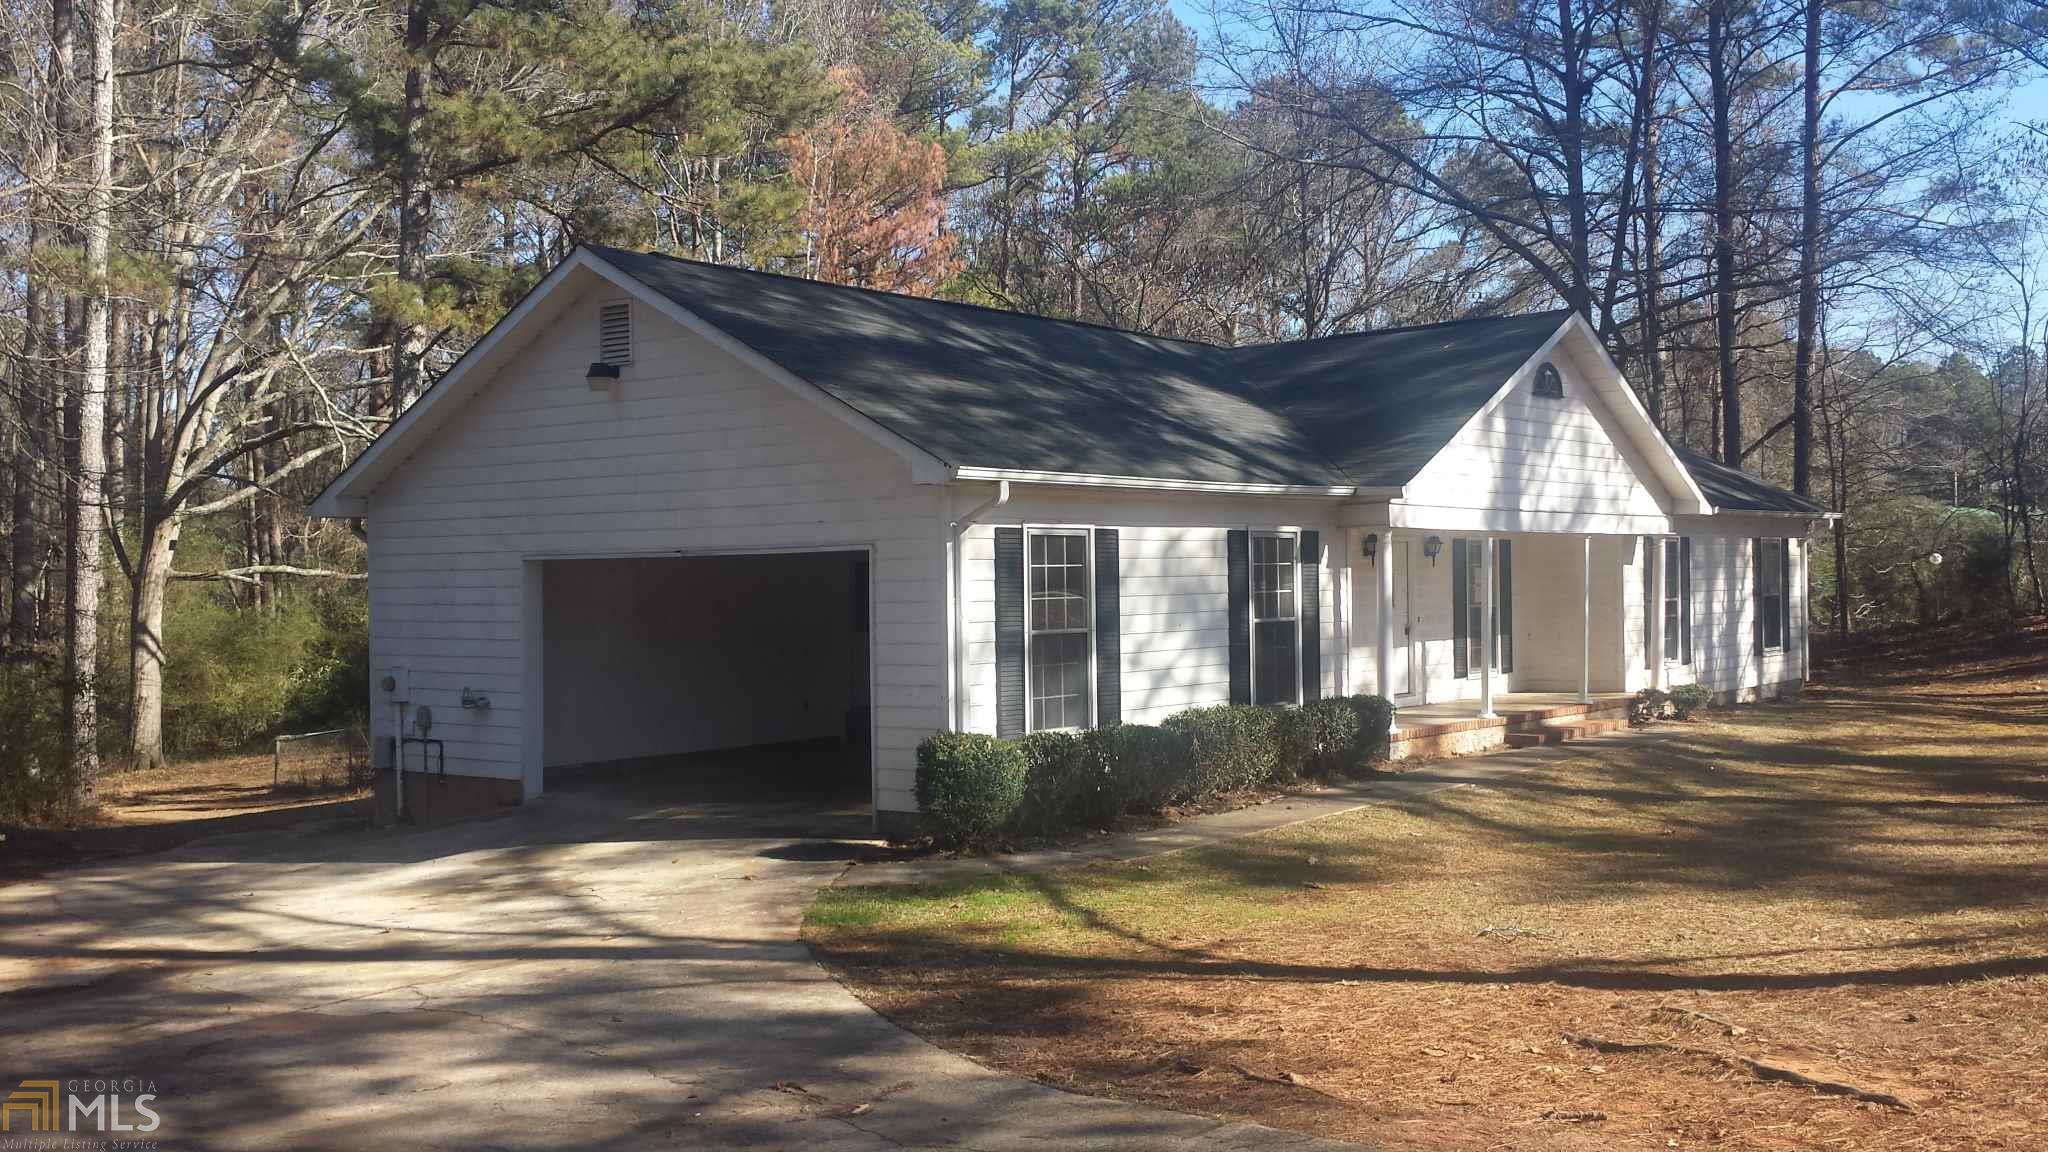 58 Belleau Woods Drive, Newnan, GA 30263